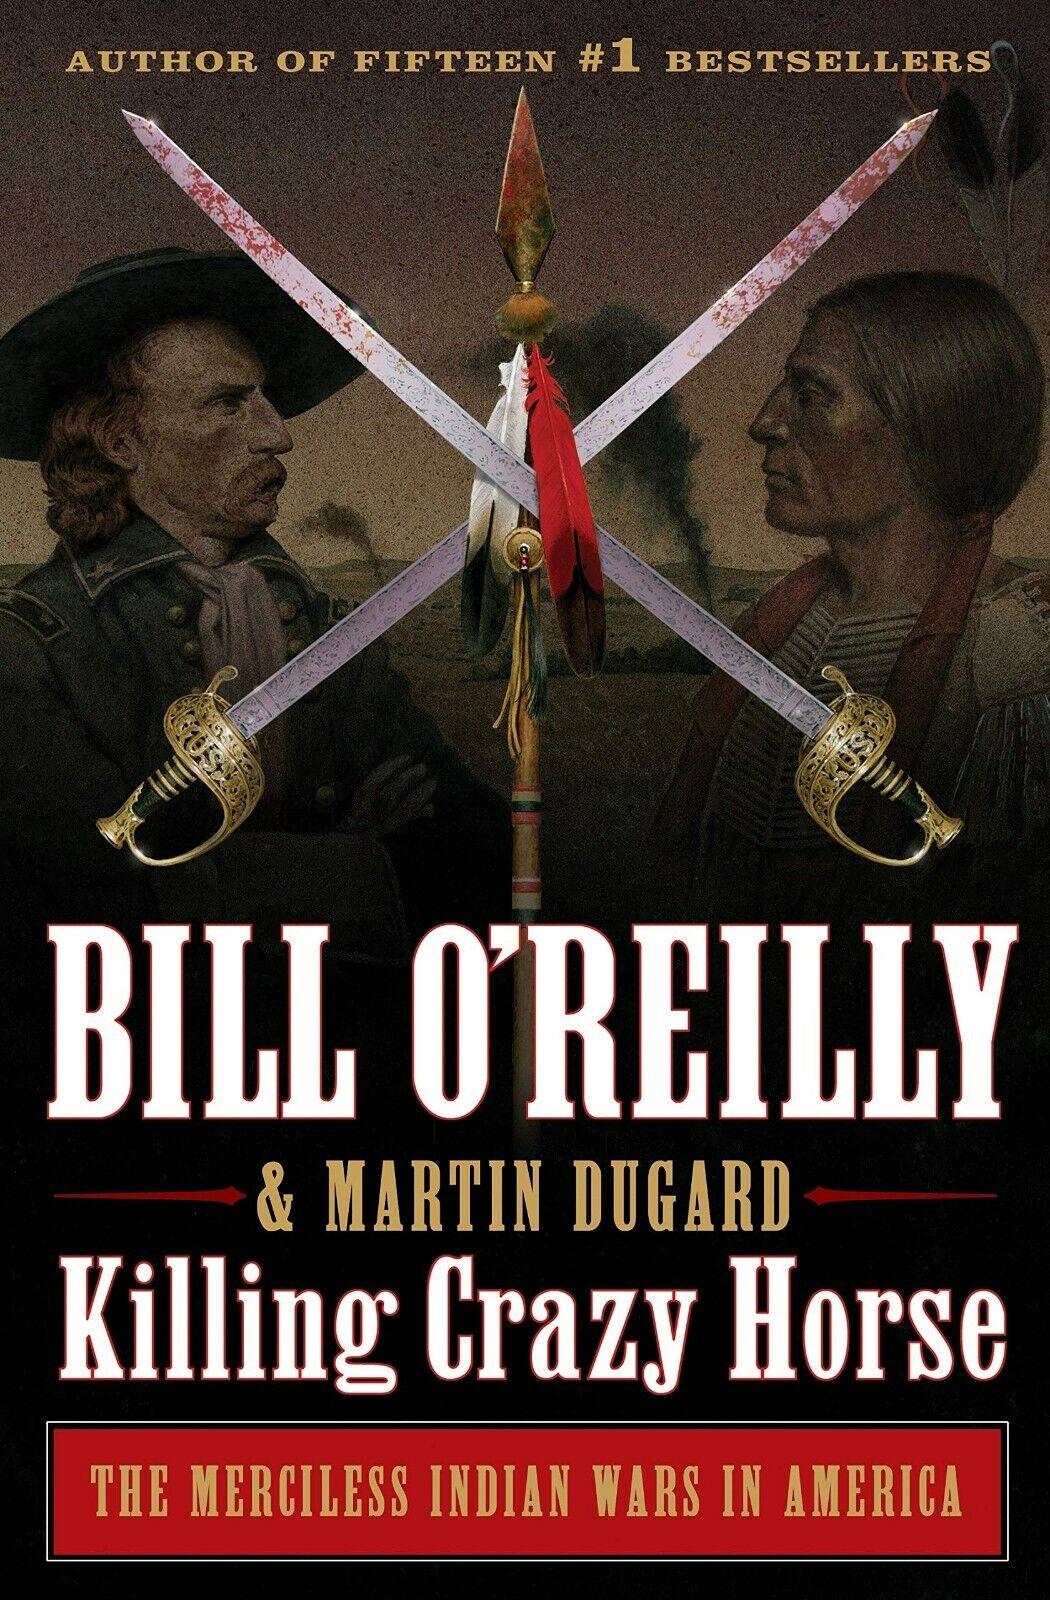 Killing Crazy Horse By Bill O Reilly 2020 READ DESCRIPTION  - $7.99